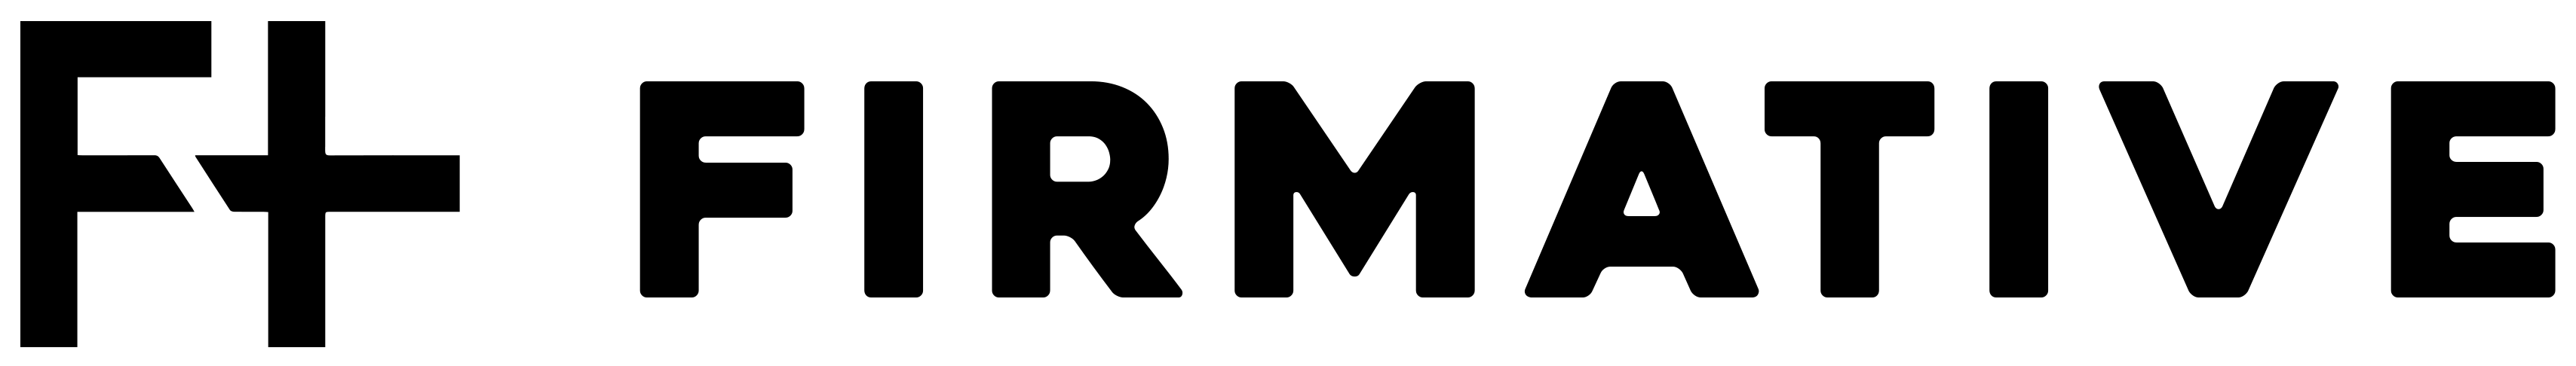 firmative_logo